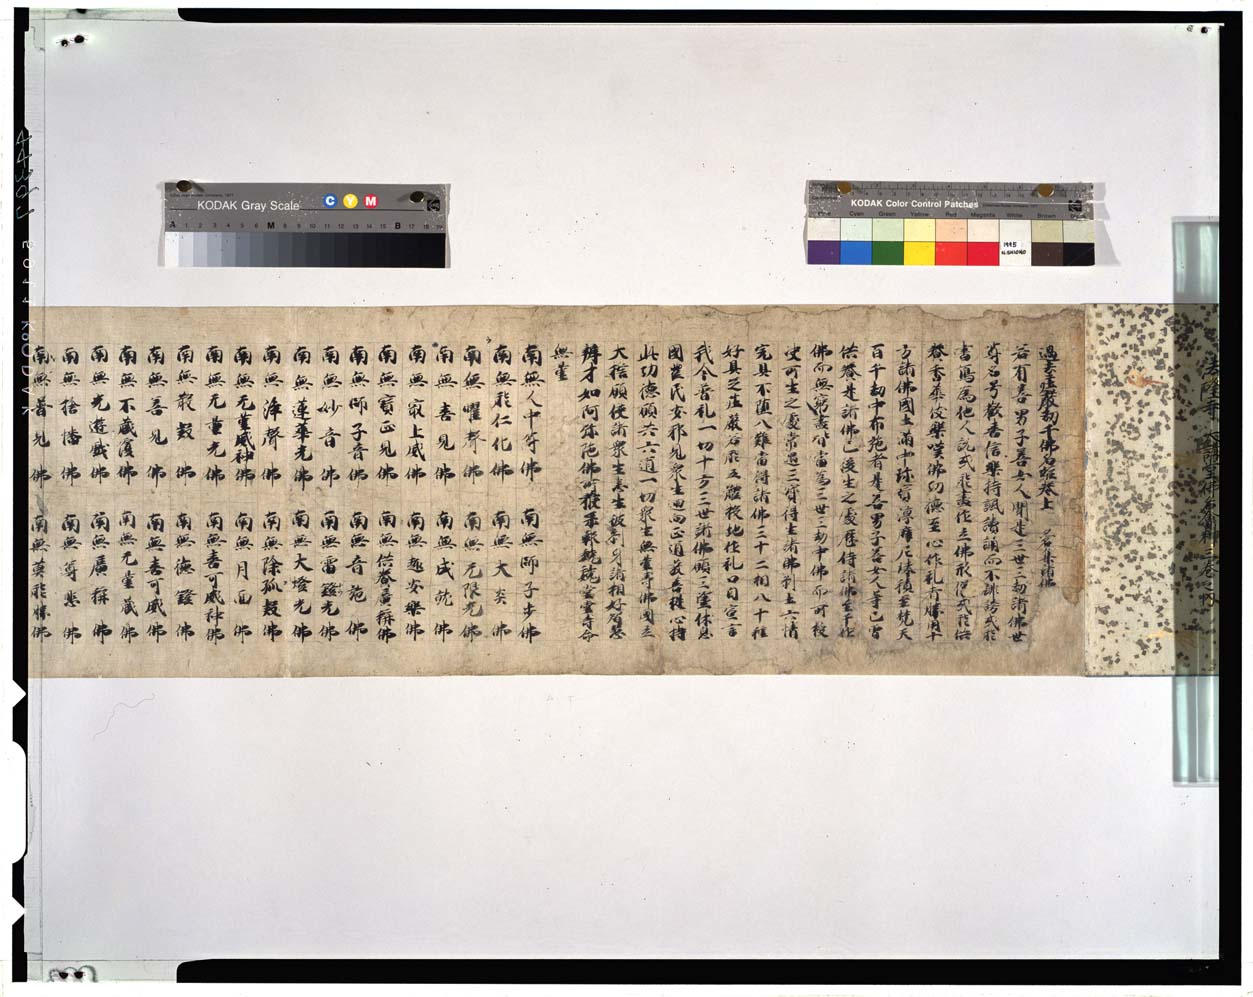 C0044397 仏名経 - 東京国立博物館 画像検索